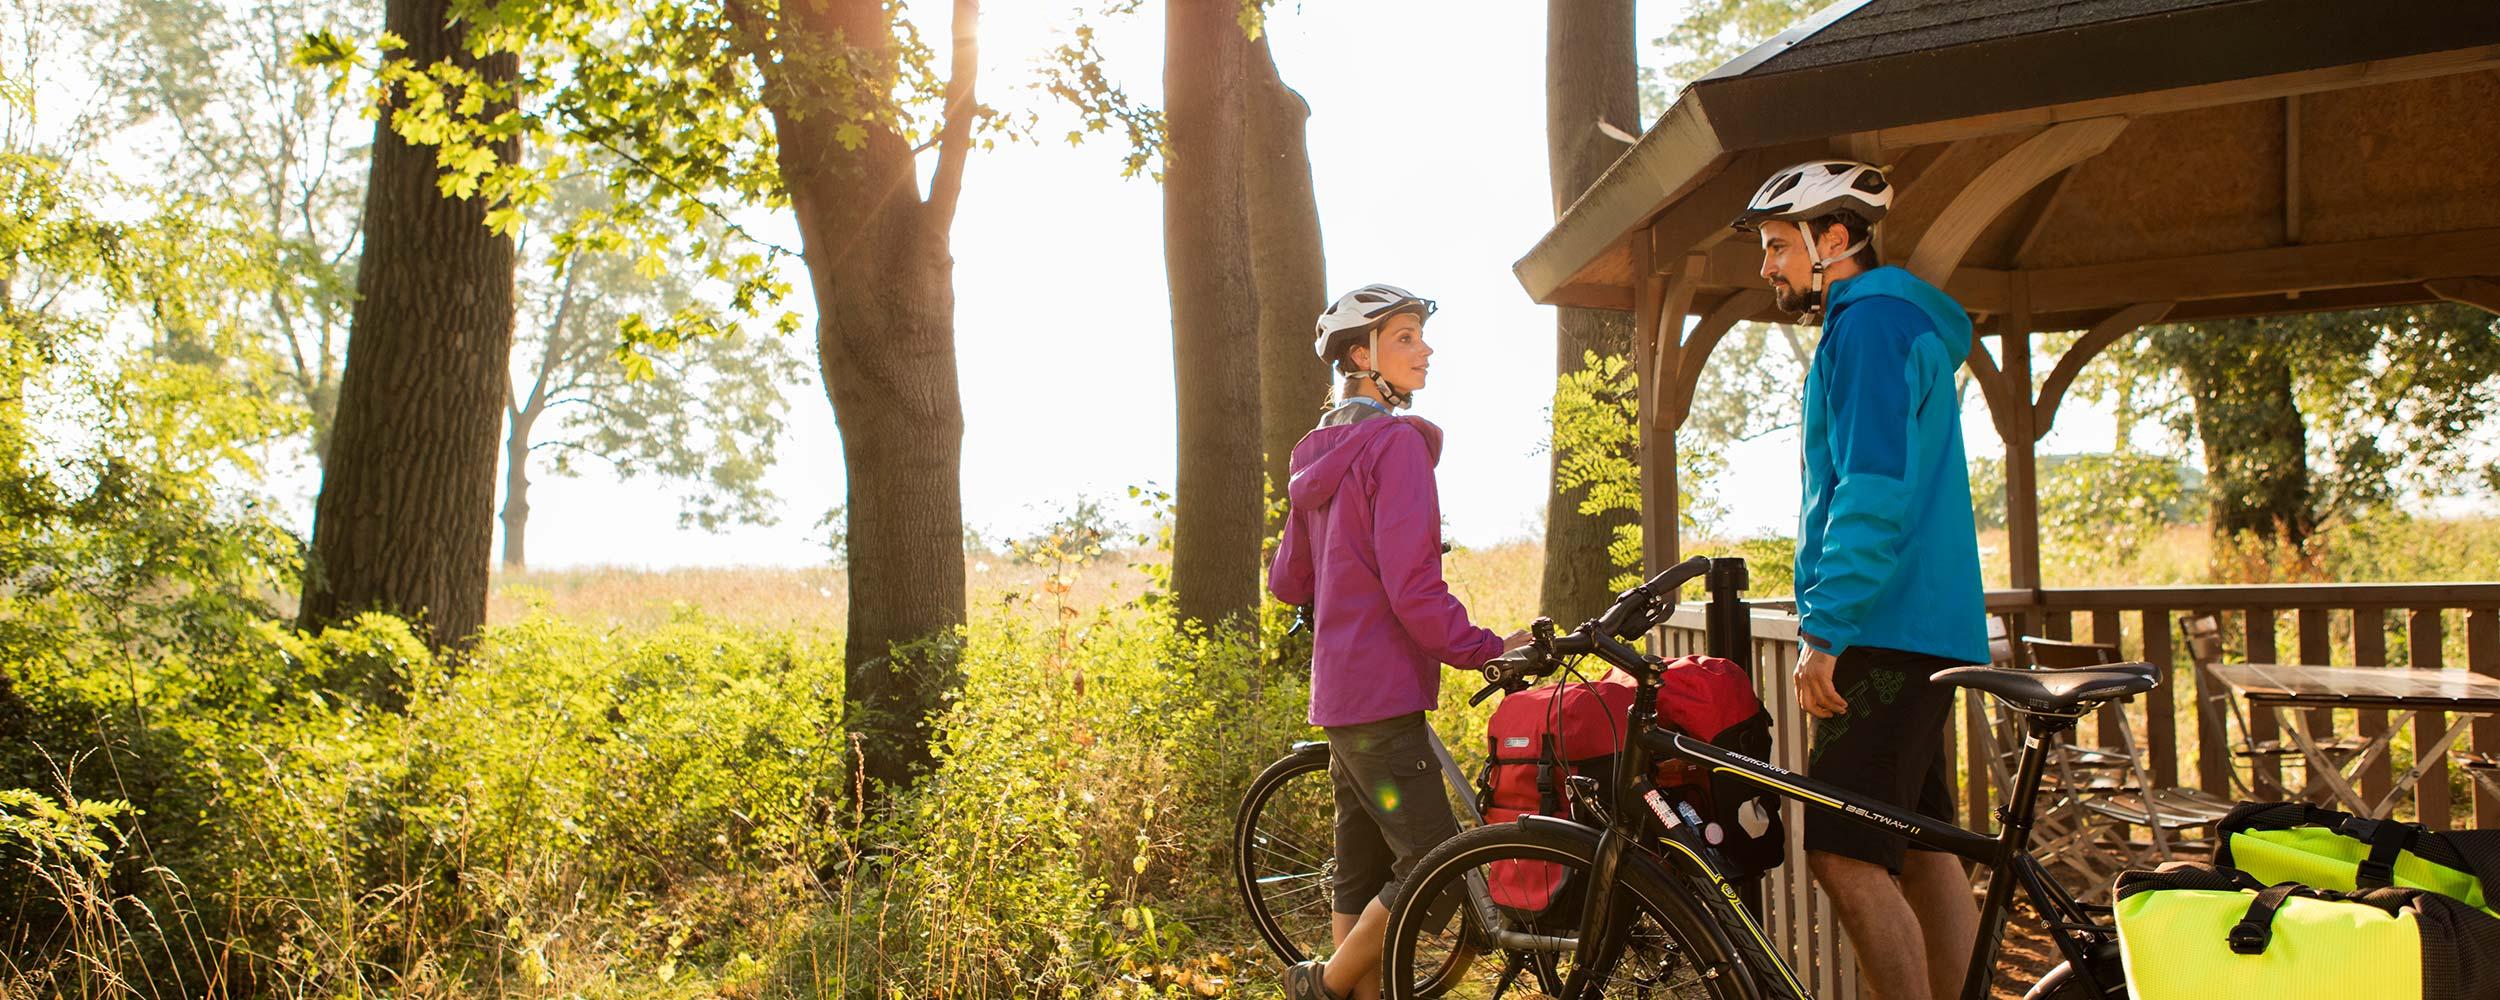 Mountainbike im Thüringer Wald | Oberhof Hotel Urlaub im Thüringenschanze